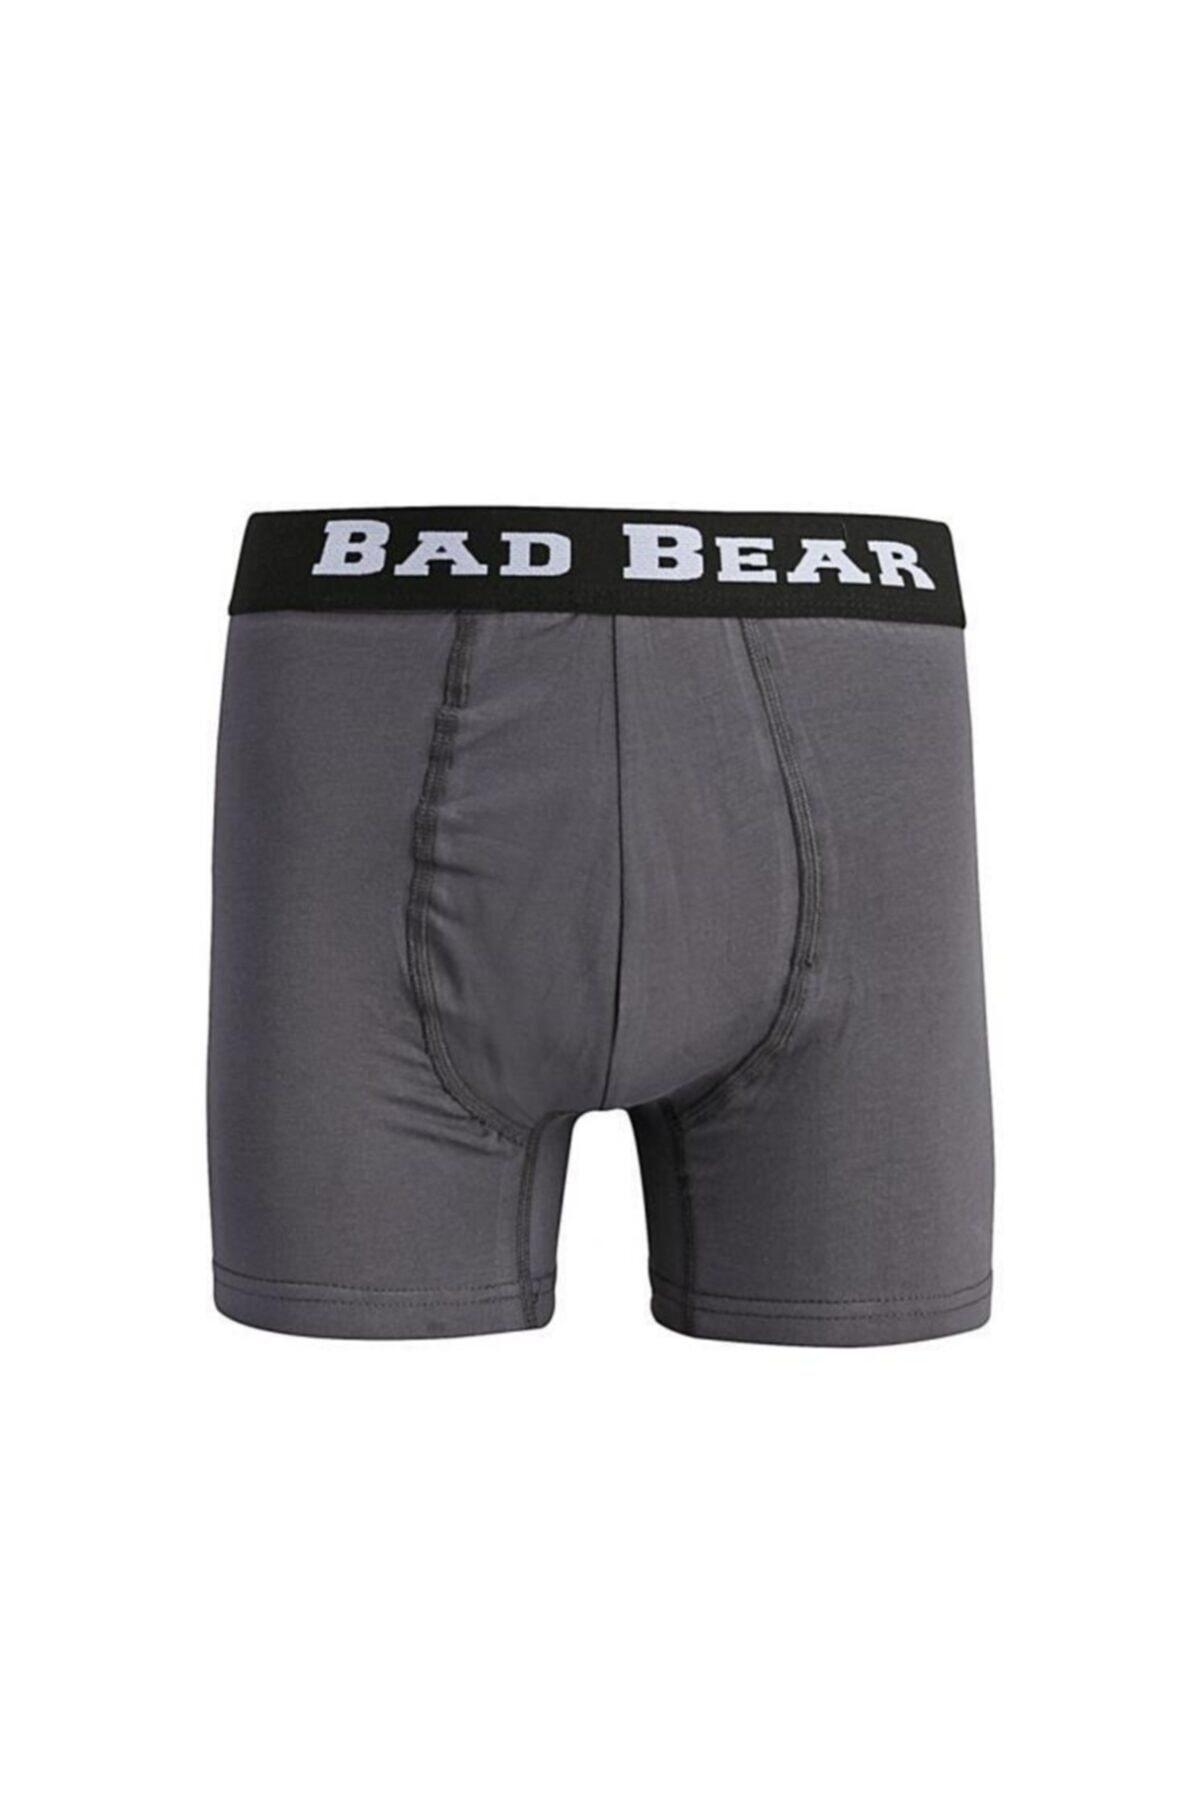 Bad Bear Erkek Boxer Düz 18.01.03.019 1